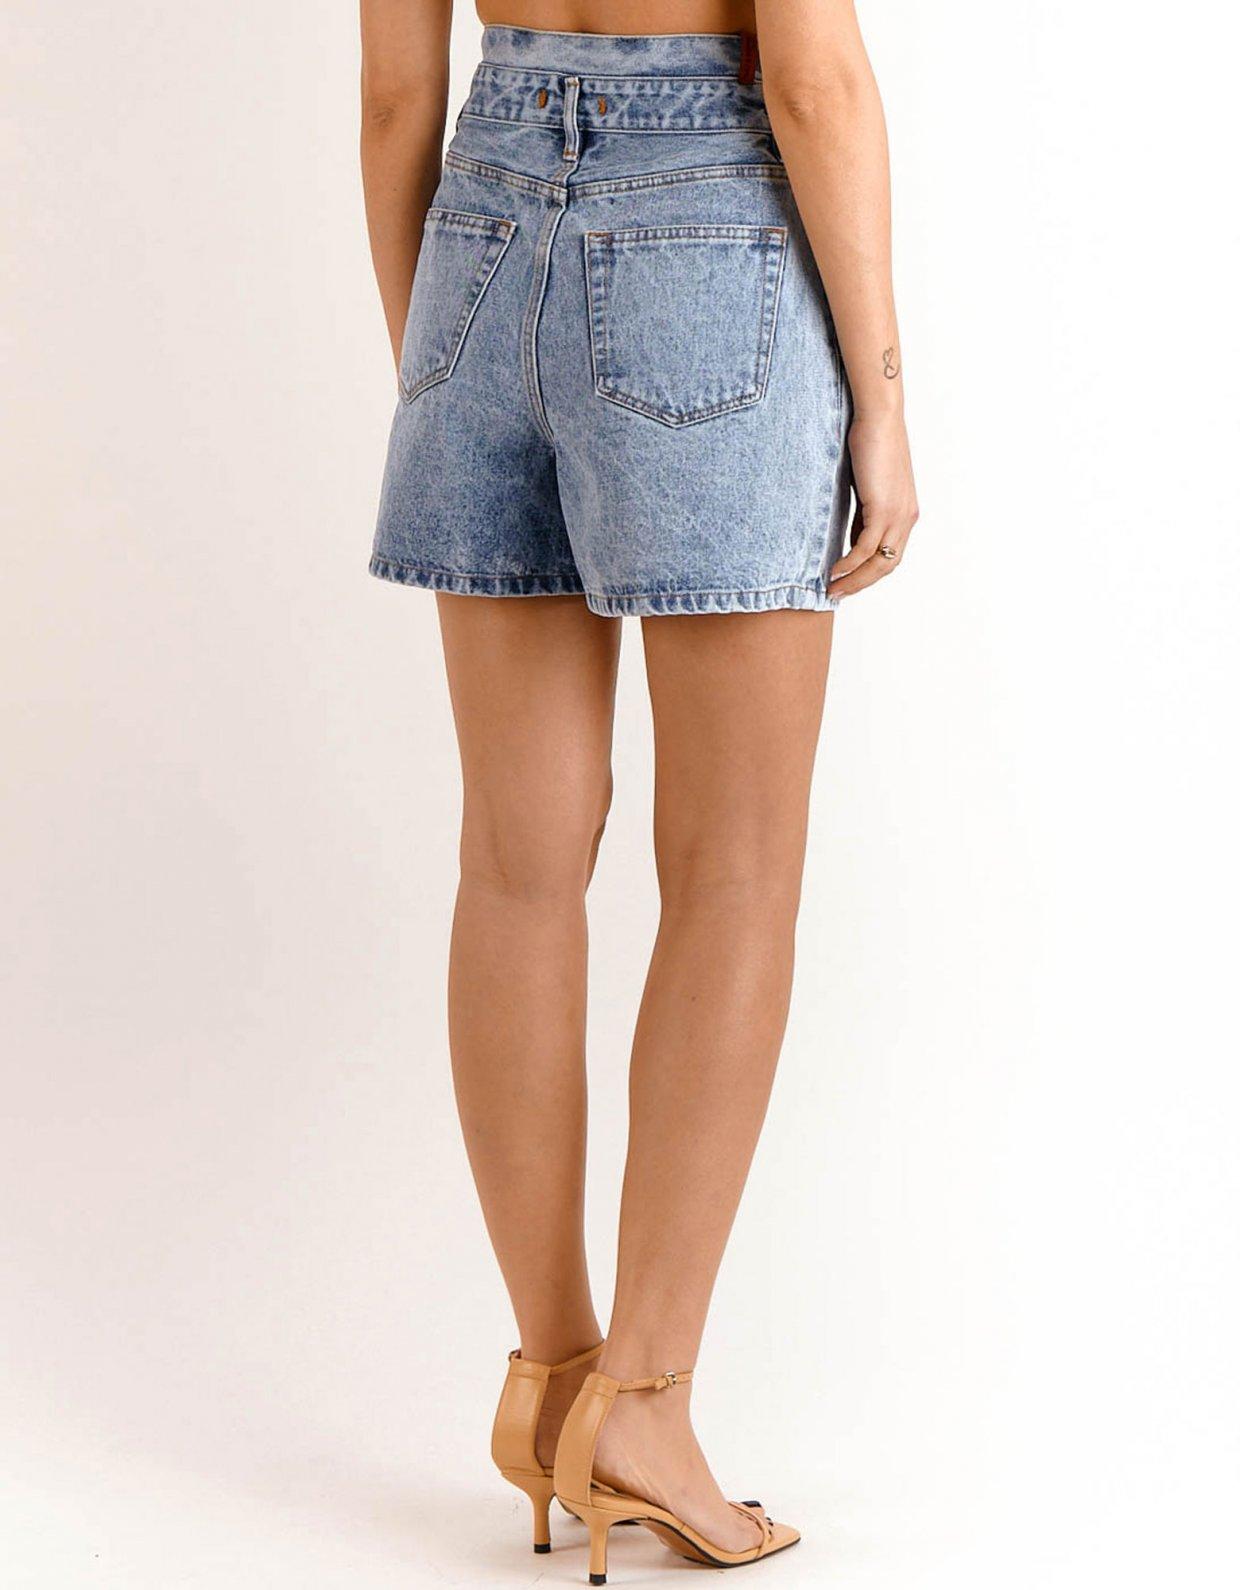 Salt & Pepper Evelyn barrel denim shorts